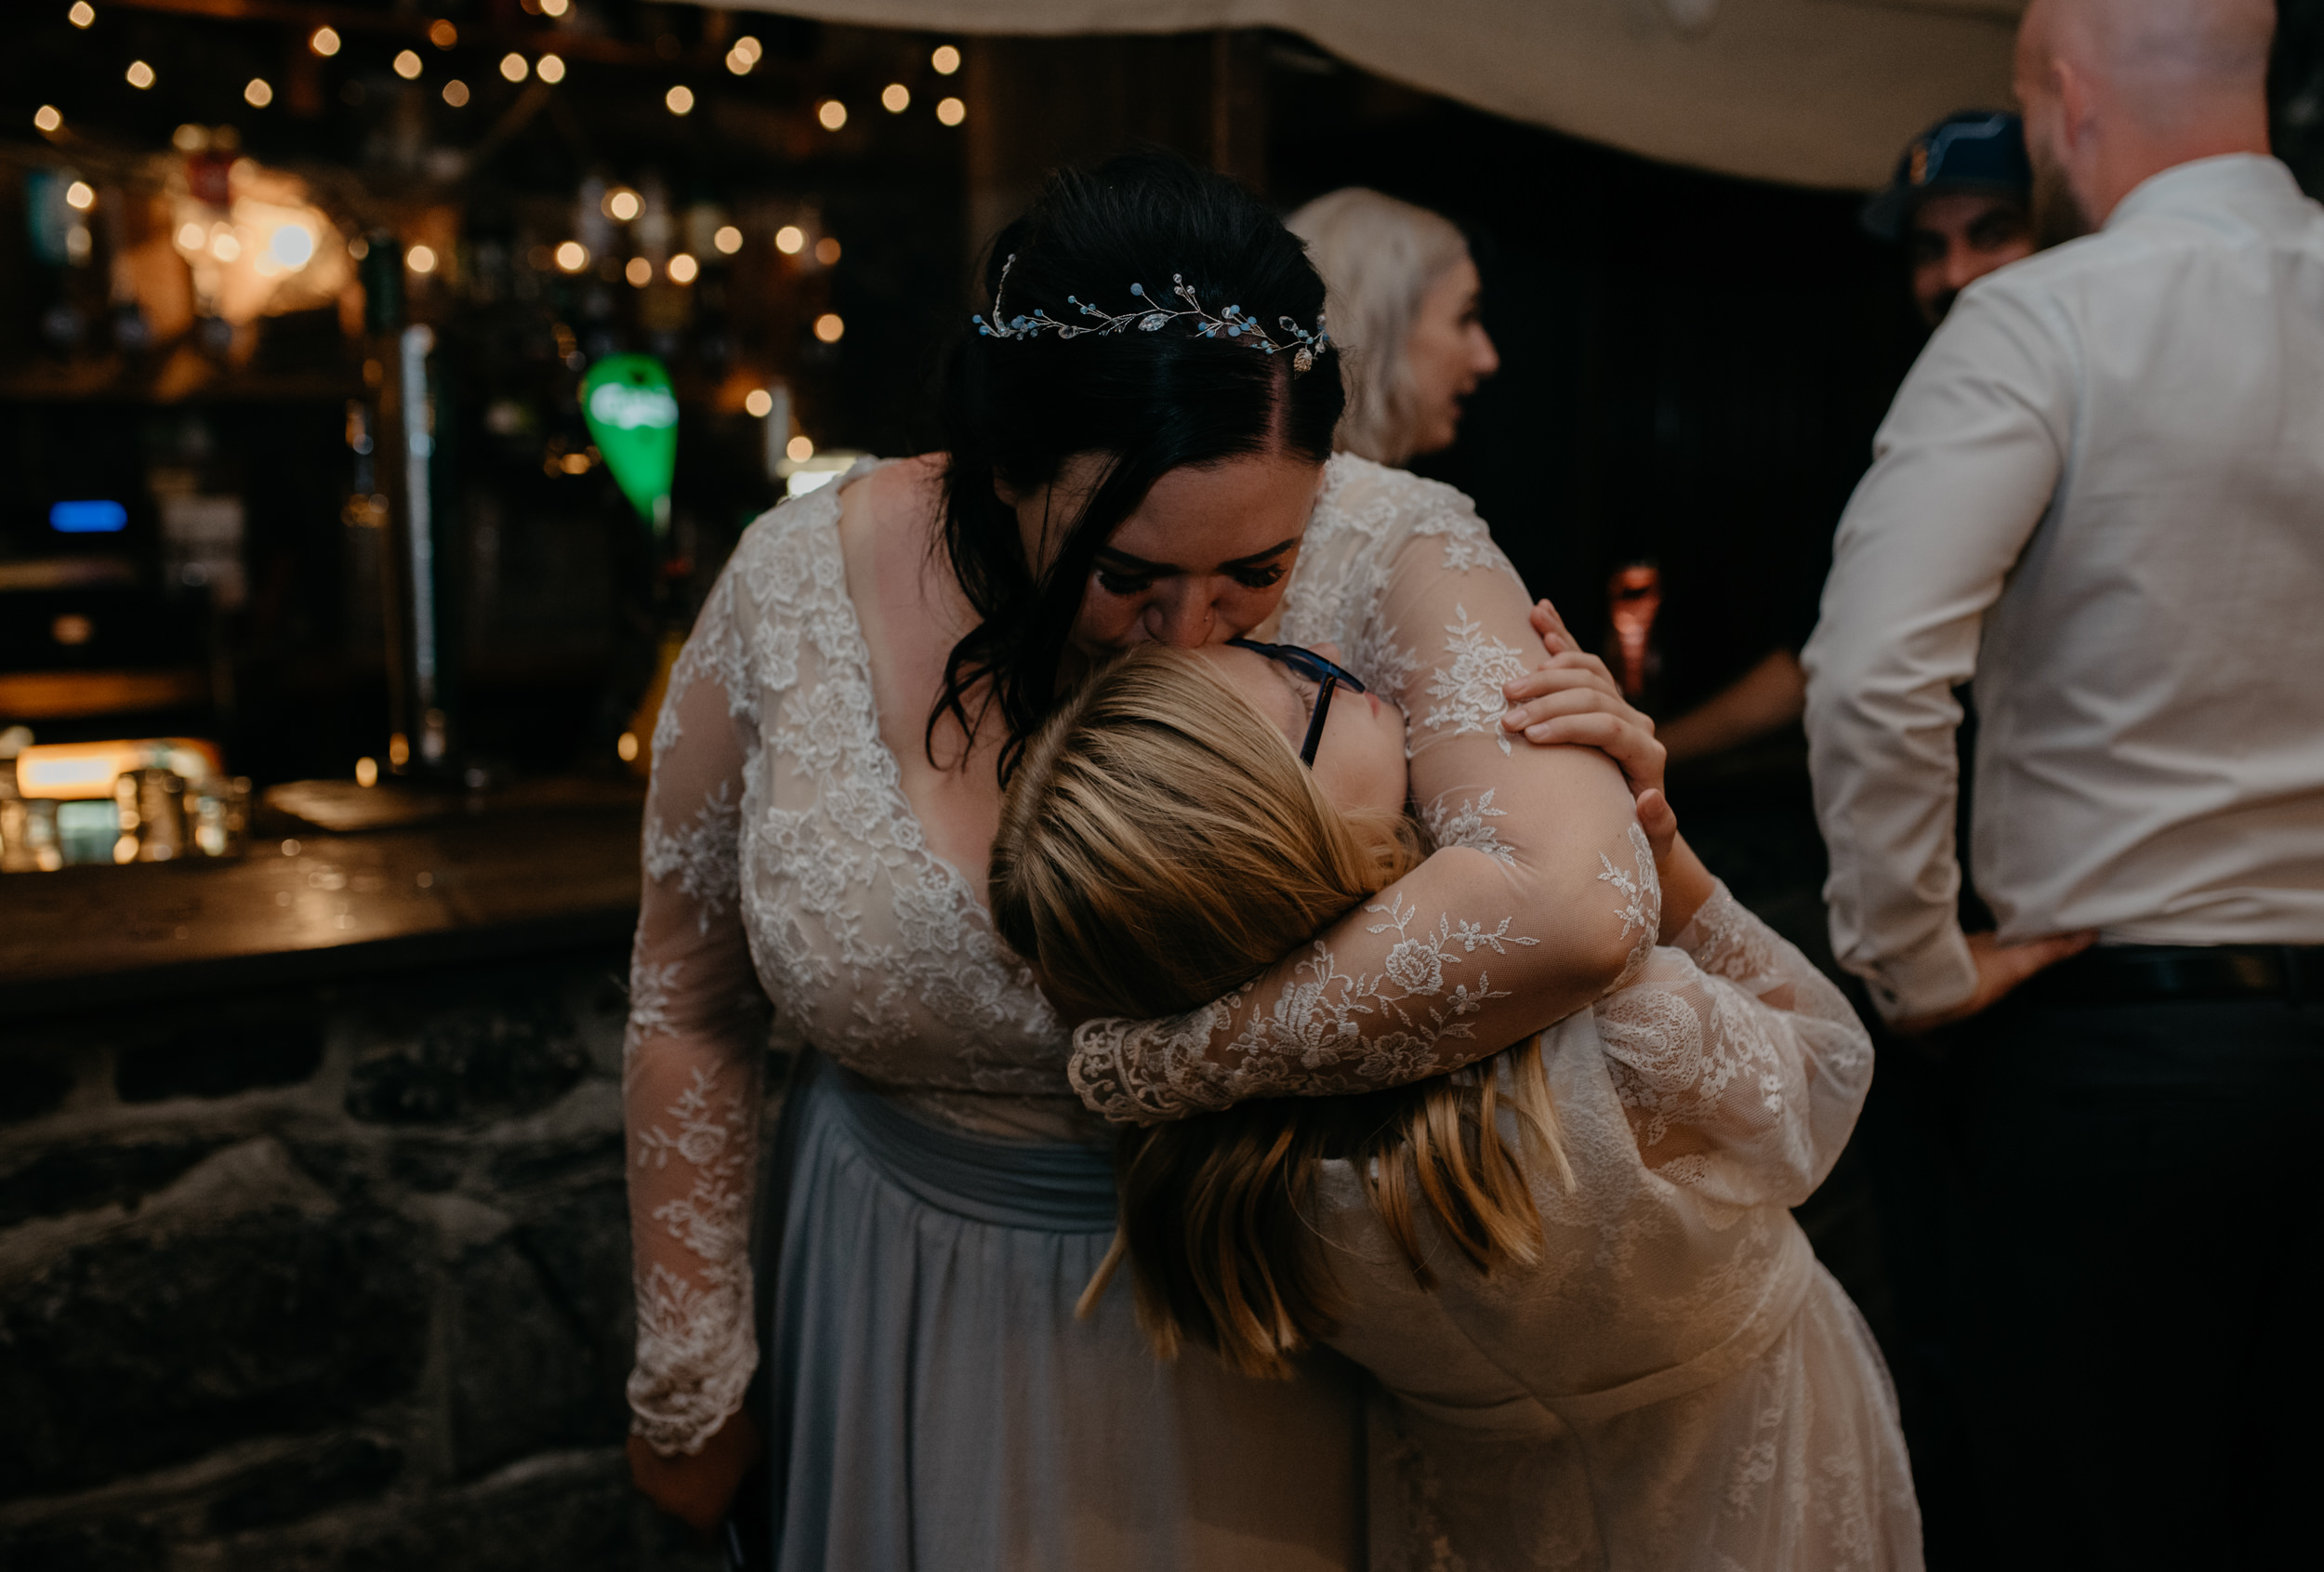 Reception at Vaughn's Pub in Kilfenora. Ireland wedding and elopement photographer.